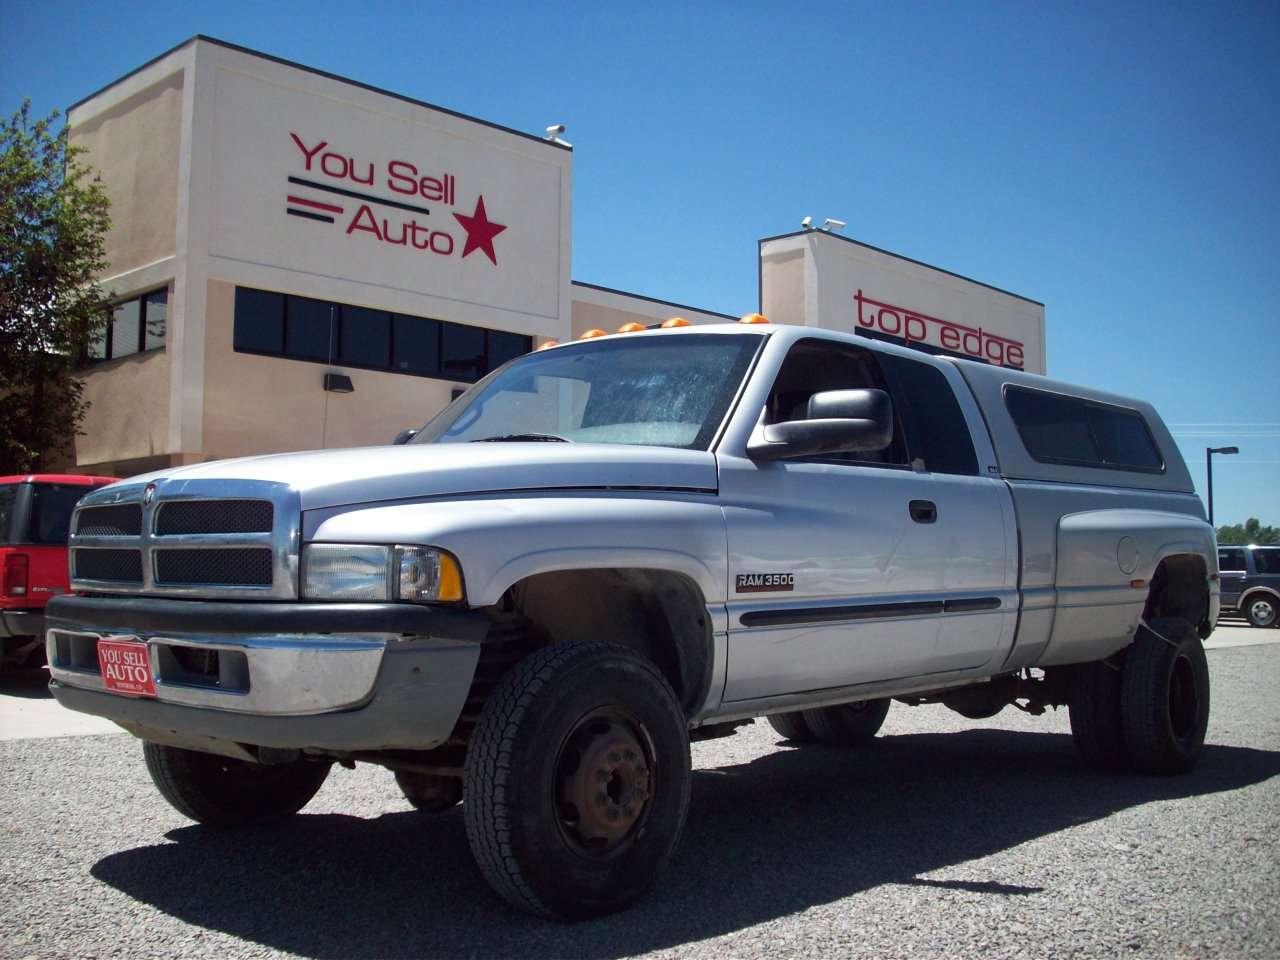 2002 dodge ram 3500 laramie slt turbo diesel 4x4 sold. Black Bedroom Furniture Sets. Home Design Ideas